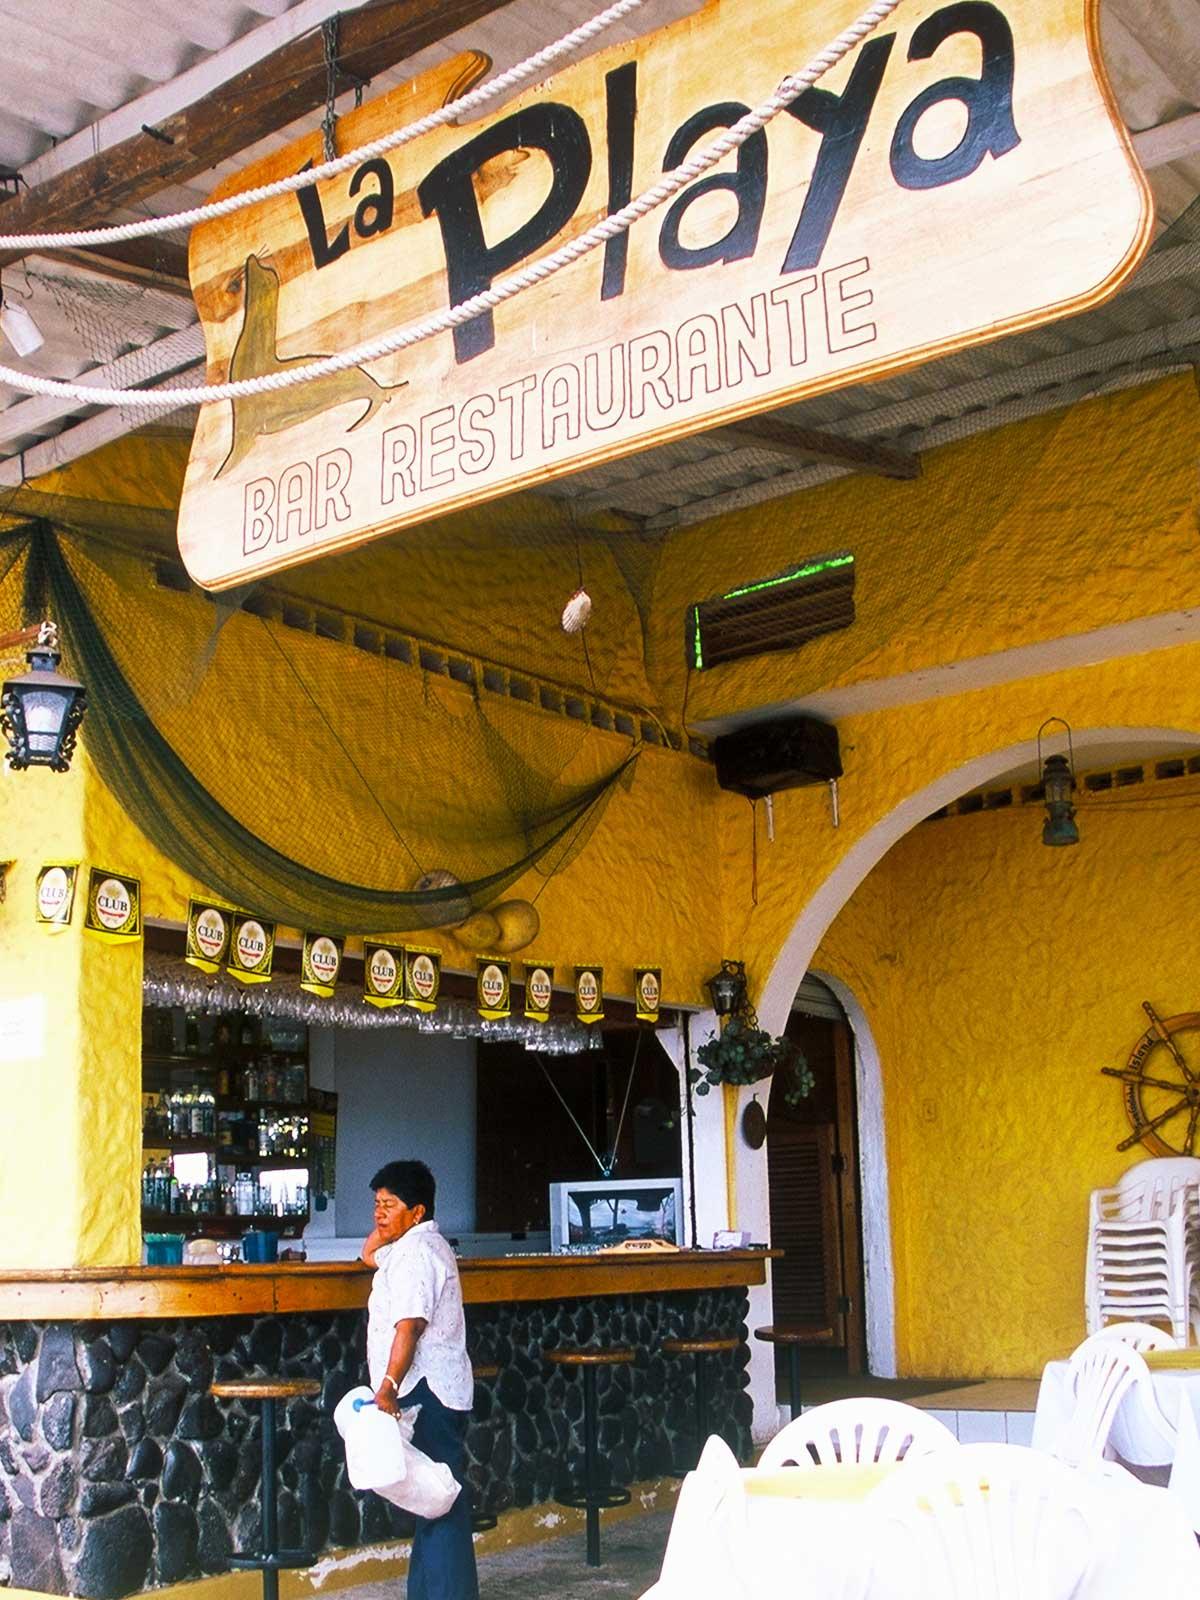 Galapagos Cafe Bar Restaurant | Steven Andrew Martin | Photo Journal | Education Research Ecuador